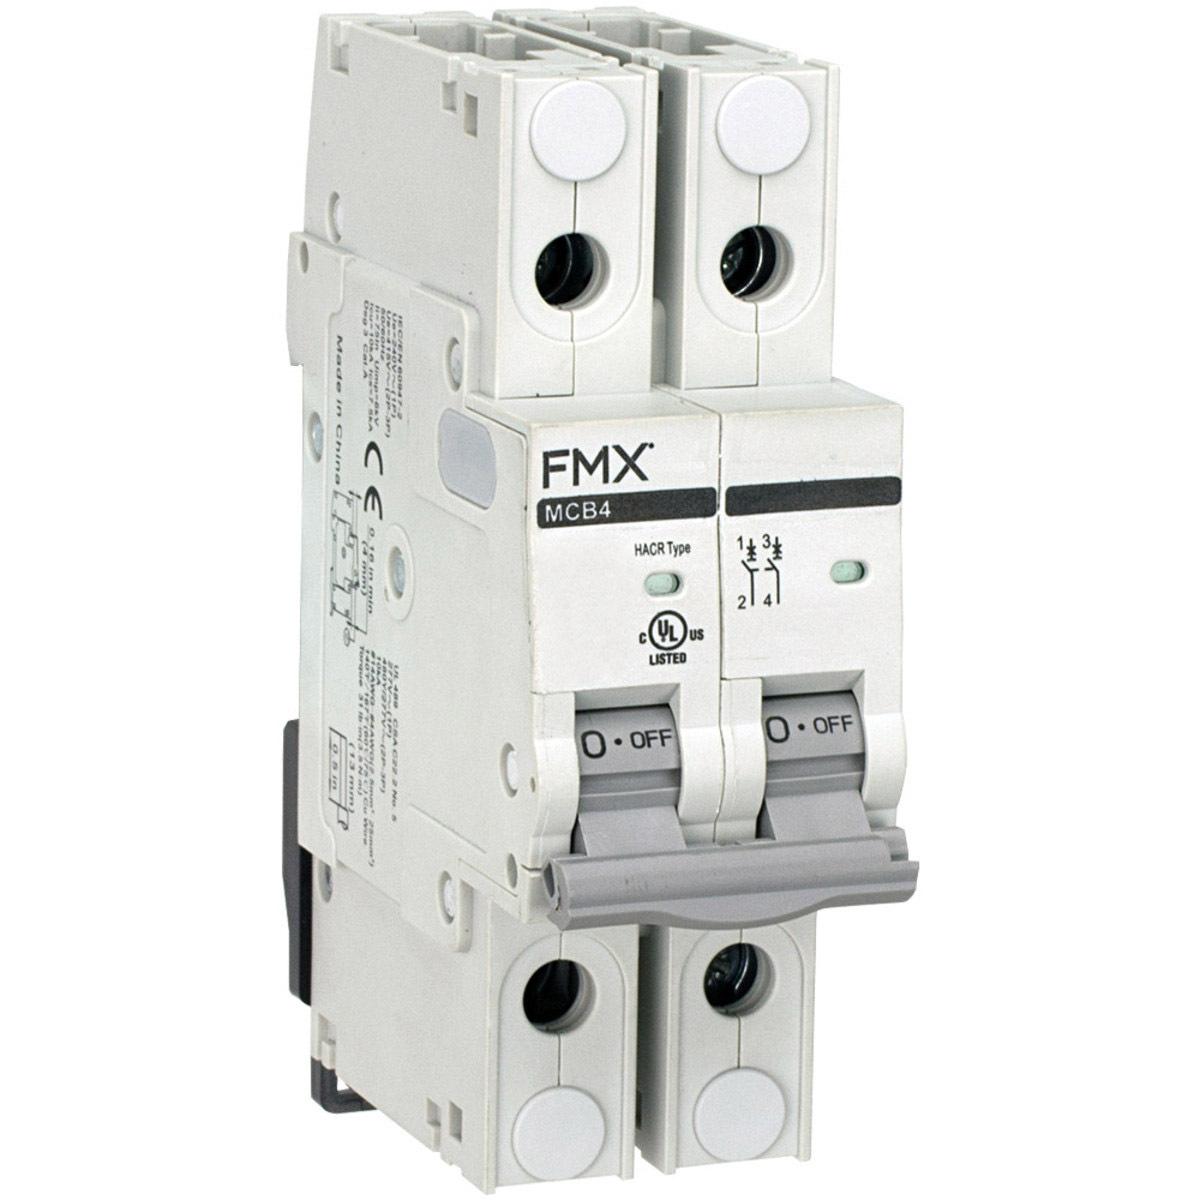 Mini Circuit Breaker UL 489 40A FMX MCB4-L2D-2P-D40 2-Pole